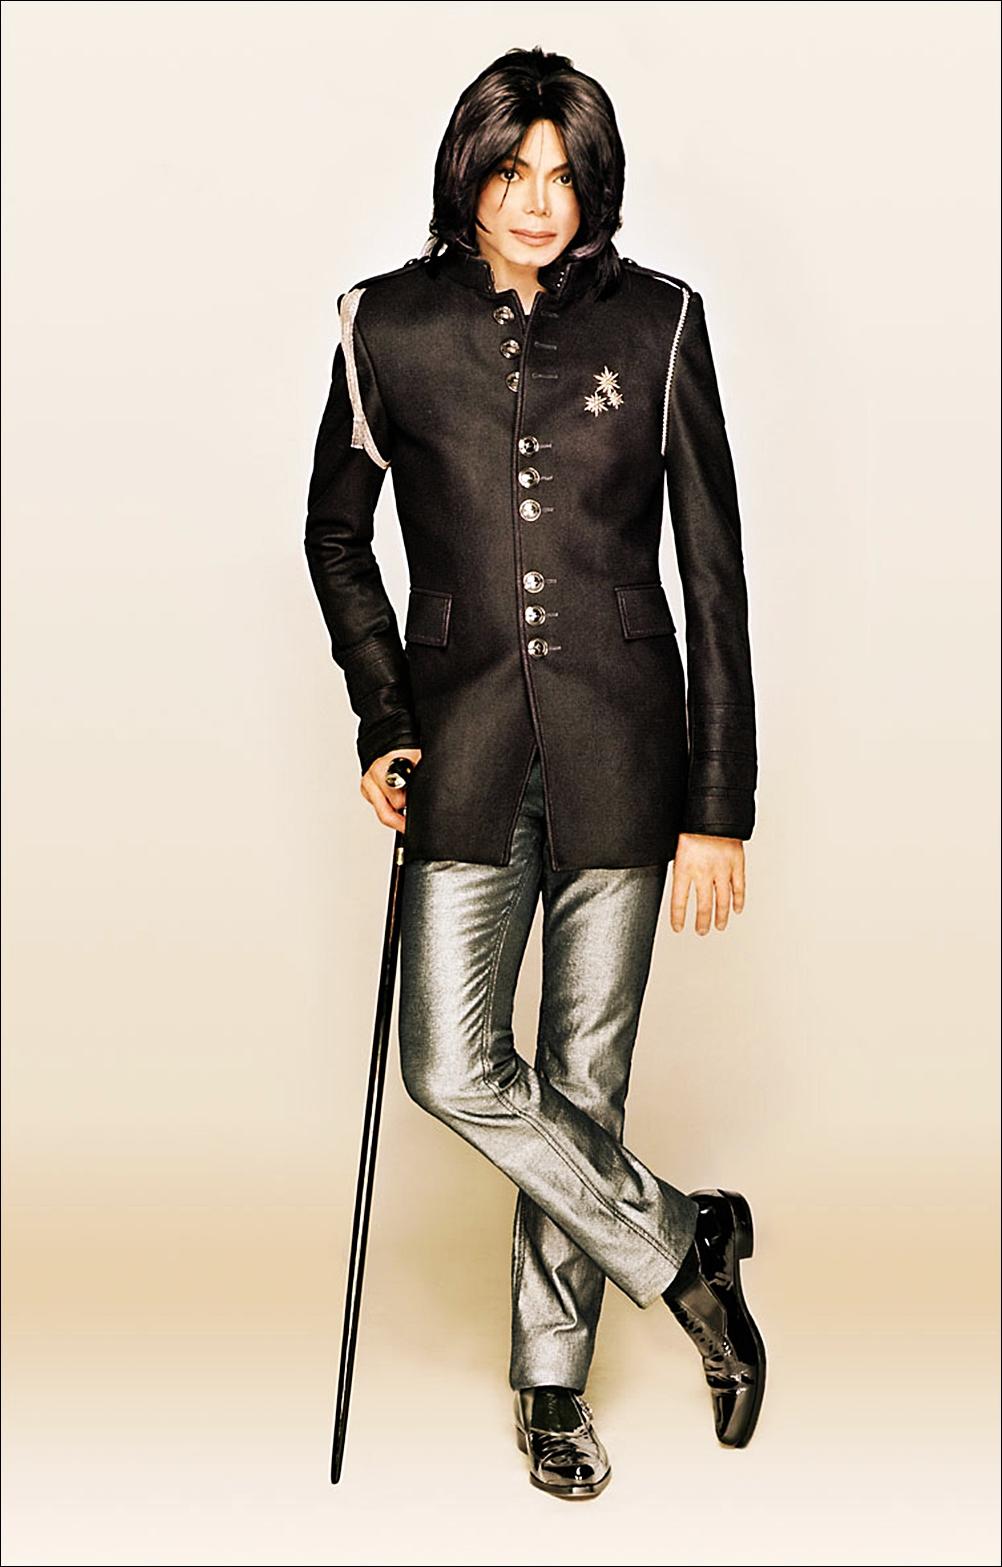 MJ- Ebony Photo Shoot - Michael Jackson Style Photo ...